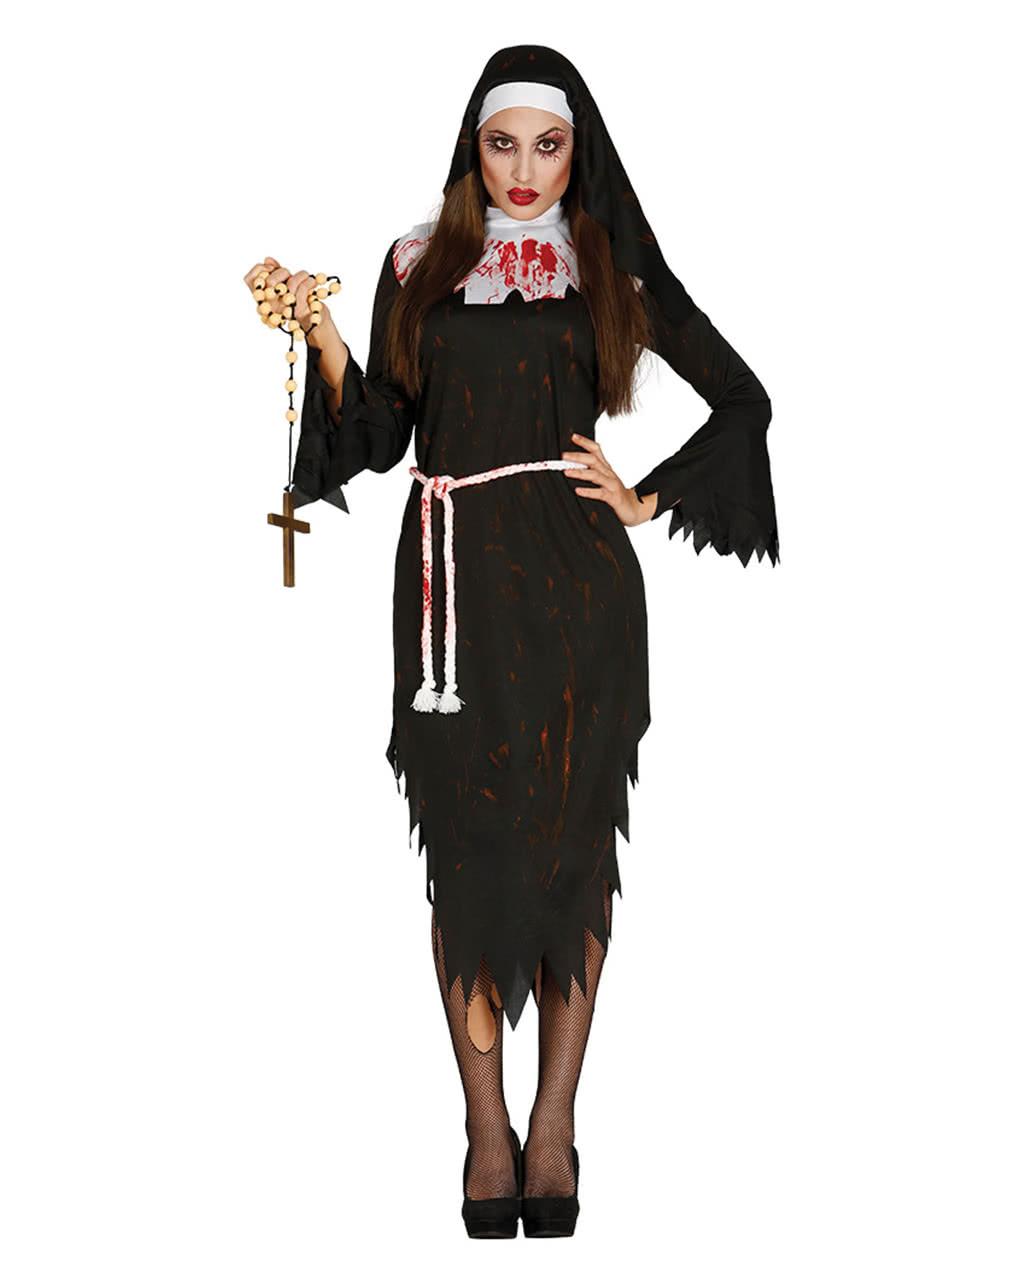 zombie nonnen kost m als verkleidung f r halloween partys horror. Black Bedroom Furniture Sets. Home Design Ideas